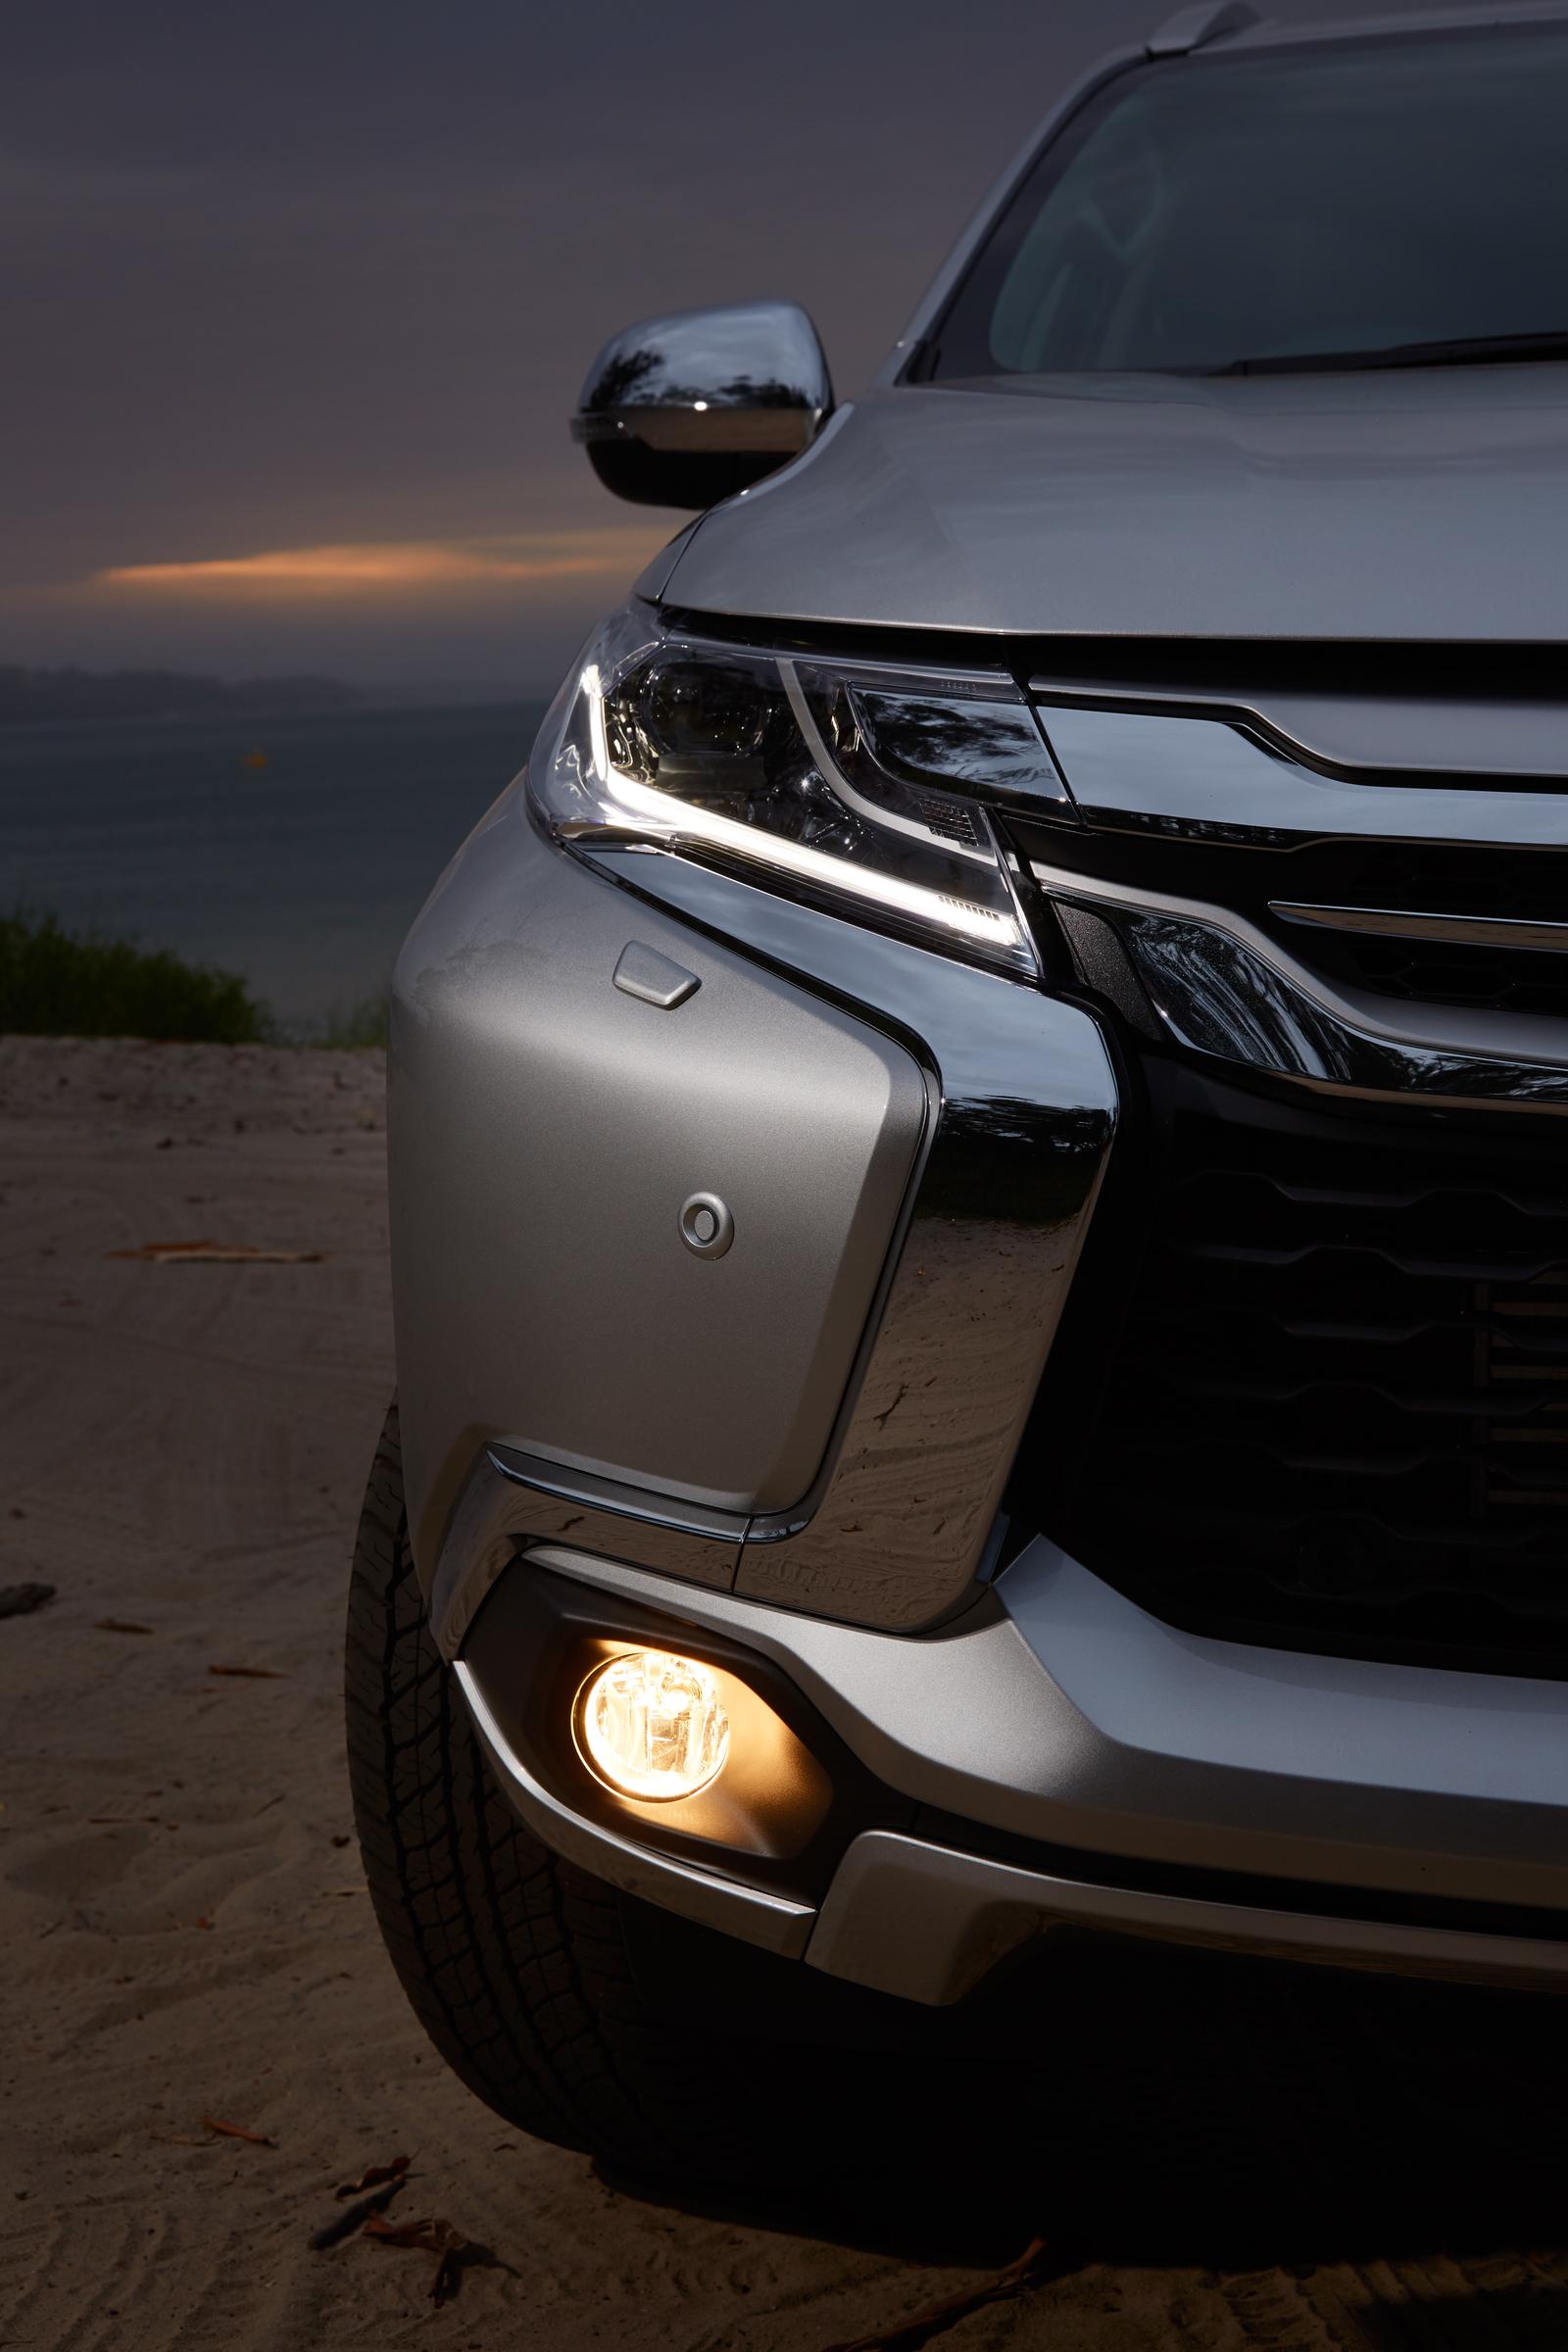 2016 Mitsubishi Pajero Sport Review - photos | CarAdvice